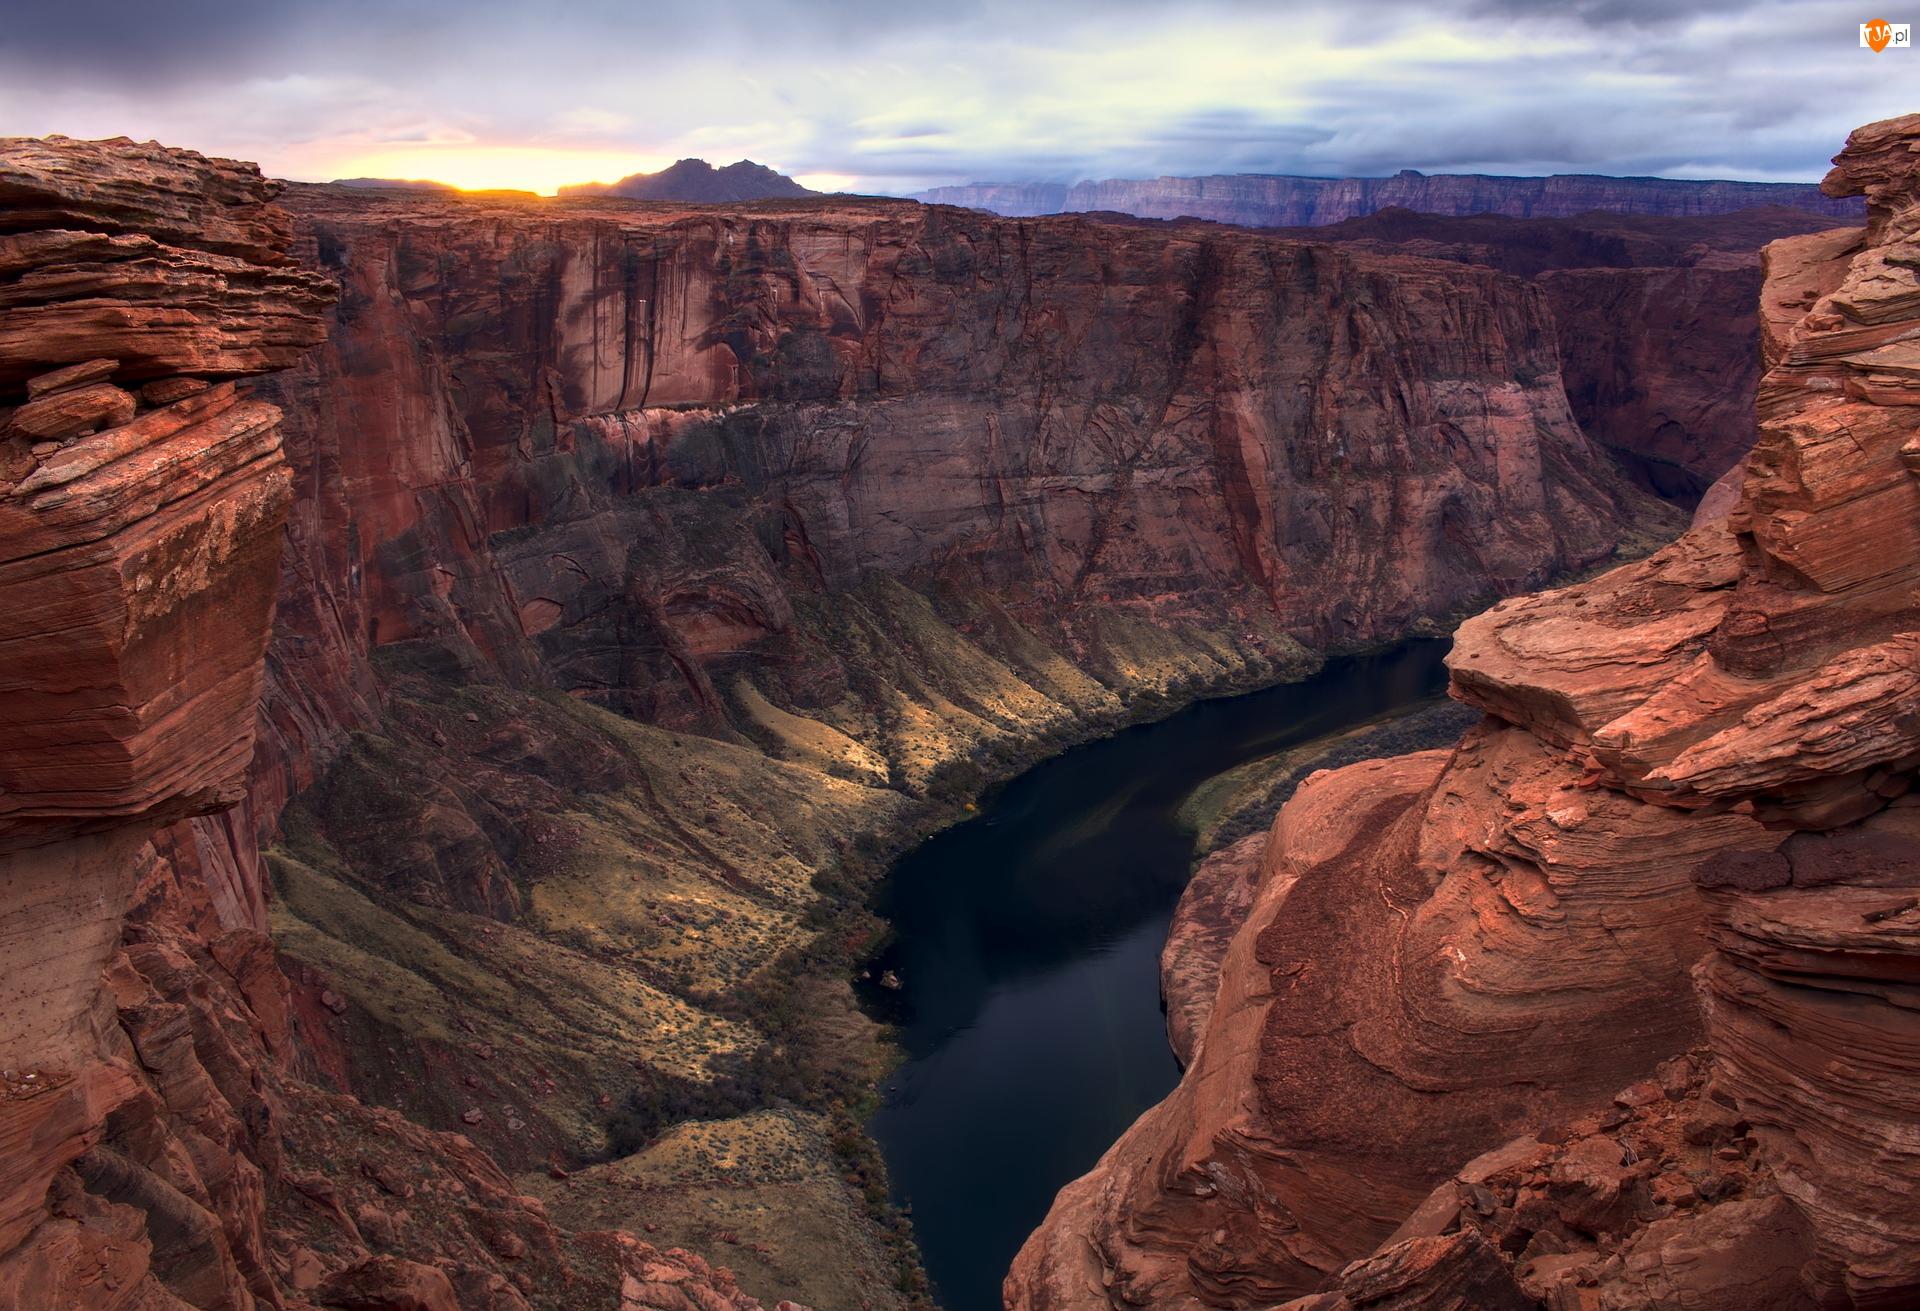 Glen Canyon, Horseshoe Bend, Stany Zjednoczone, Kanion, Stan Arizona, Skały, Rzeka Kolorado